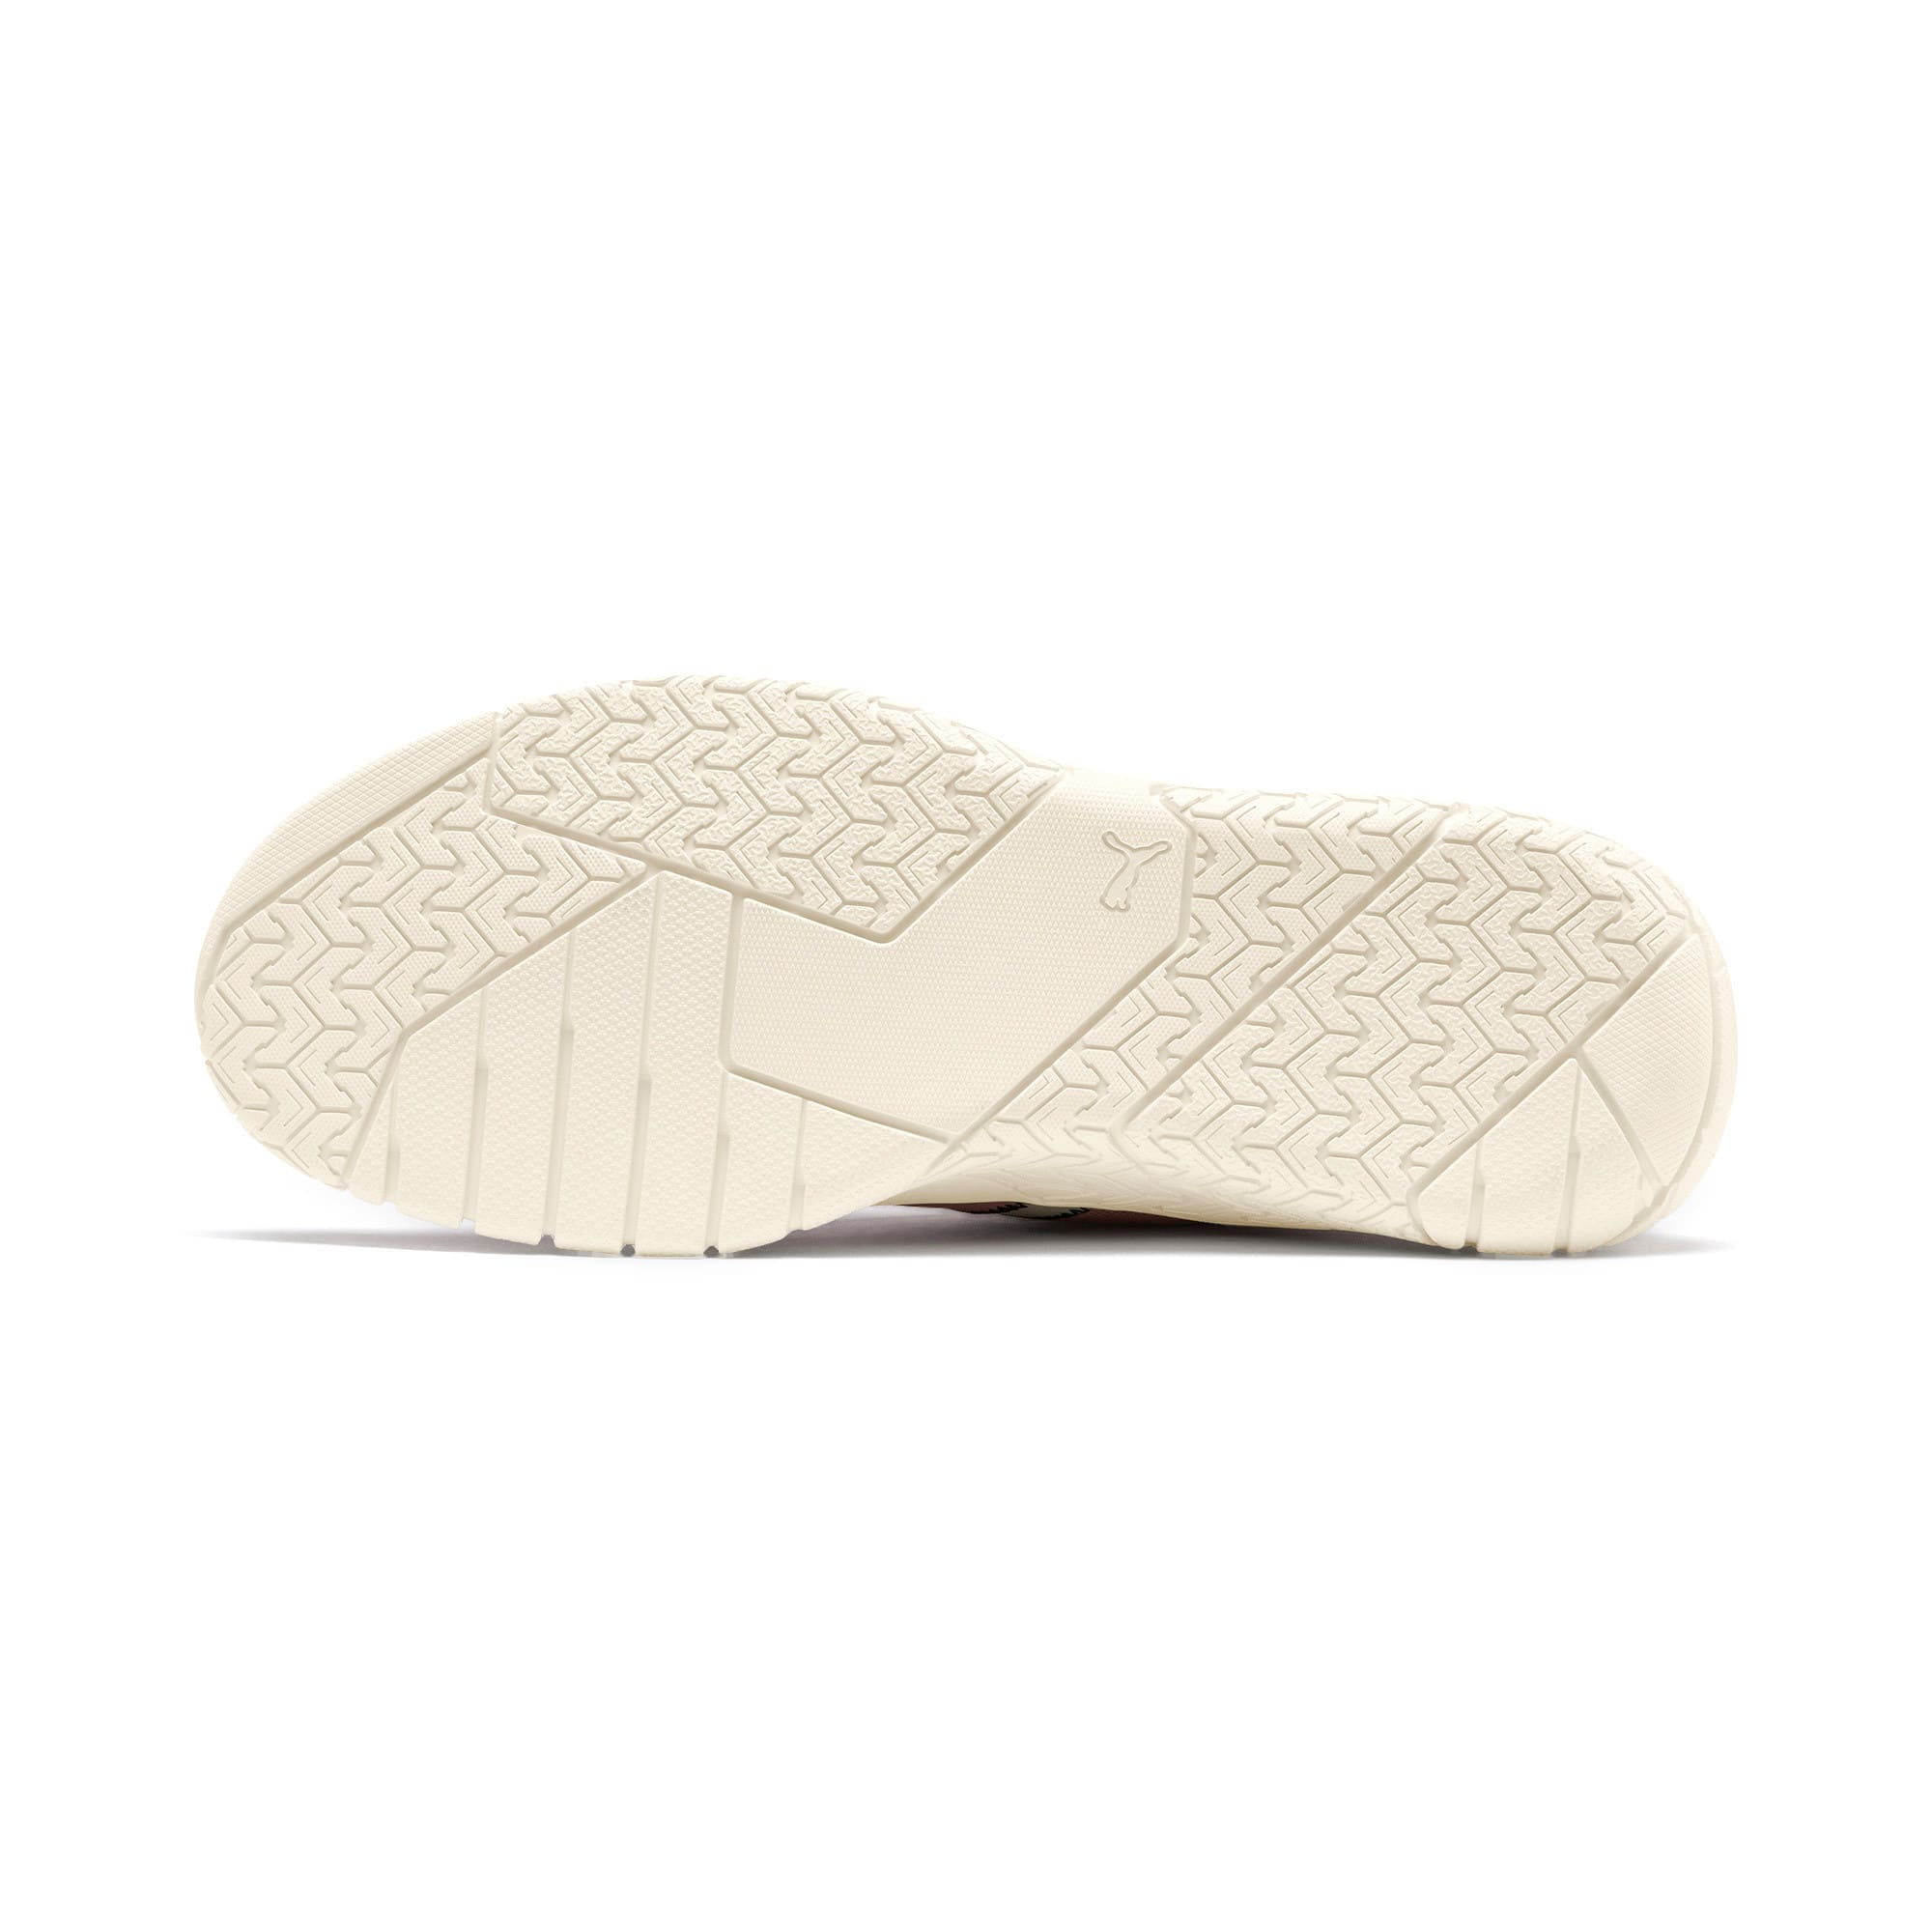 Thumbnail 4 of Replicat-X Circuit Motorsport Shoes, Bridal Rose-Whisper White, medium